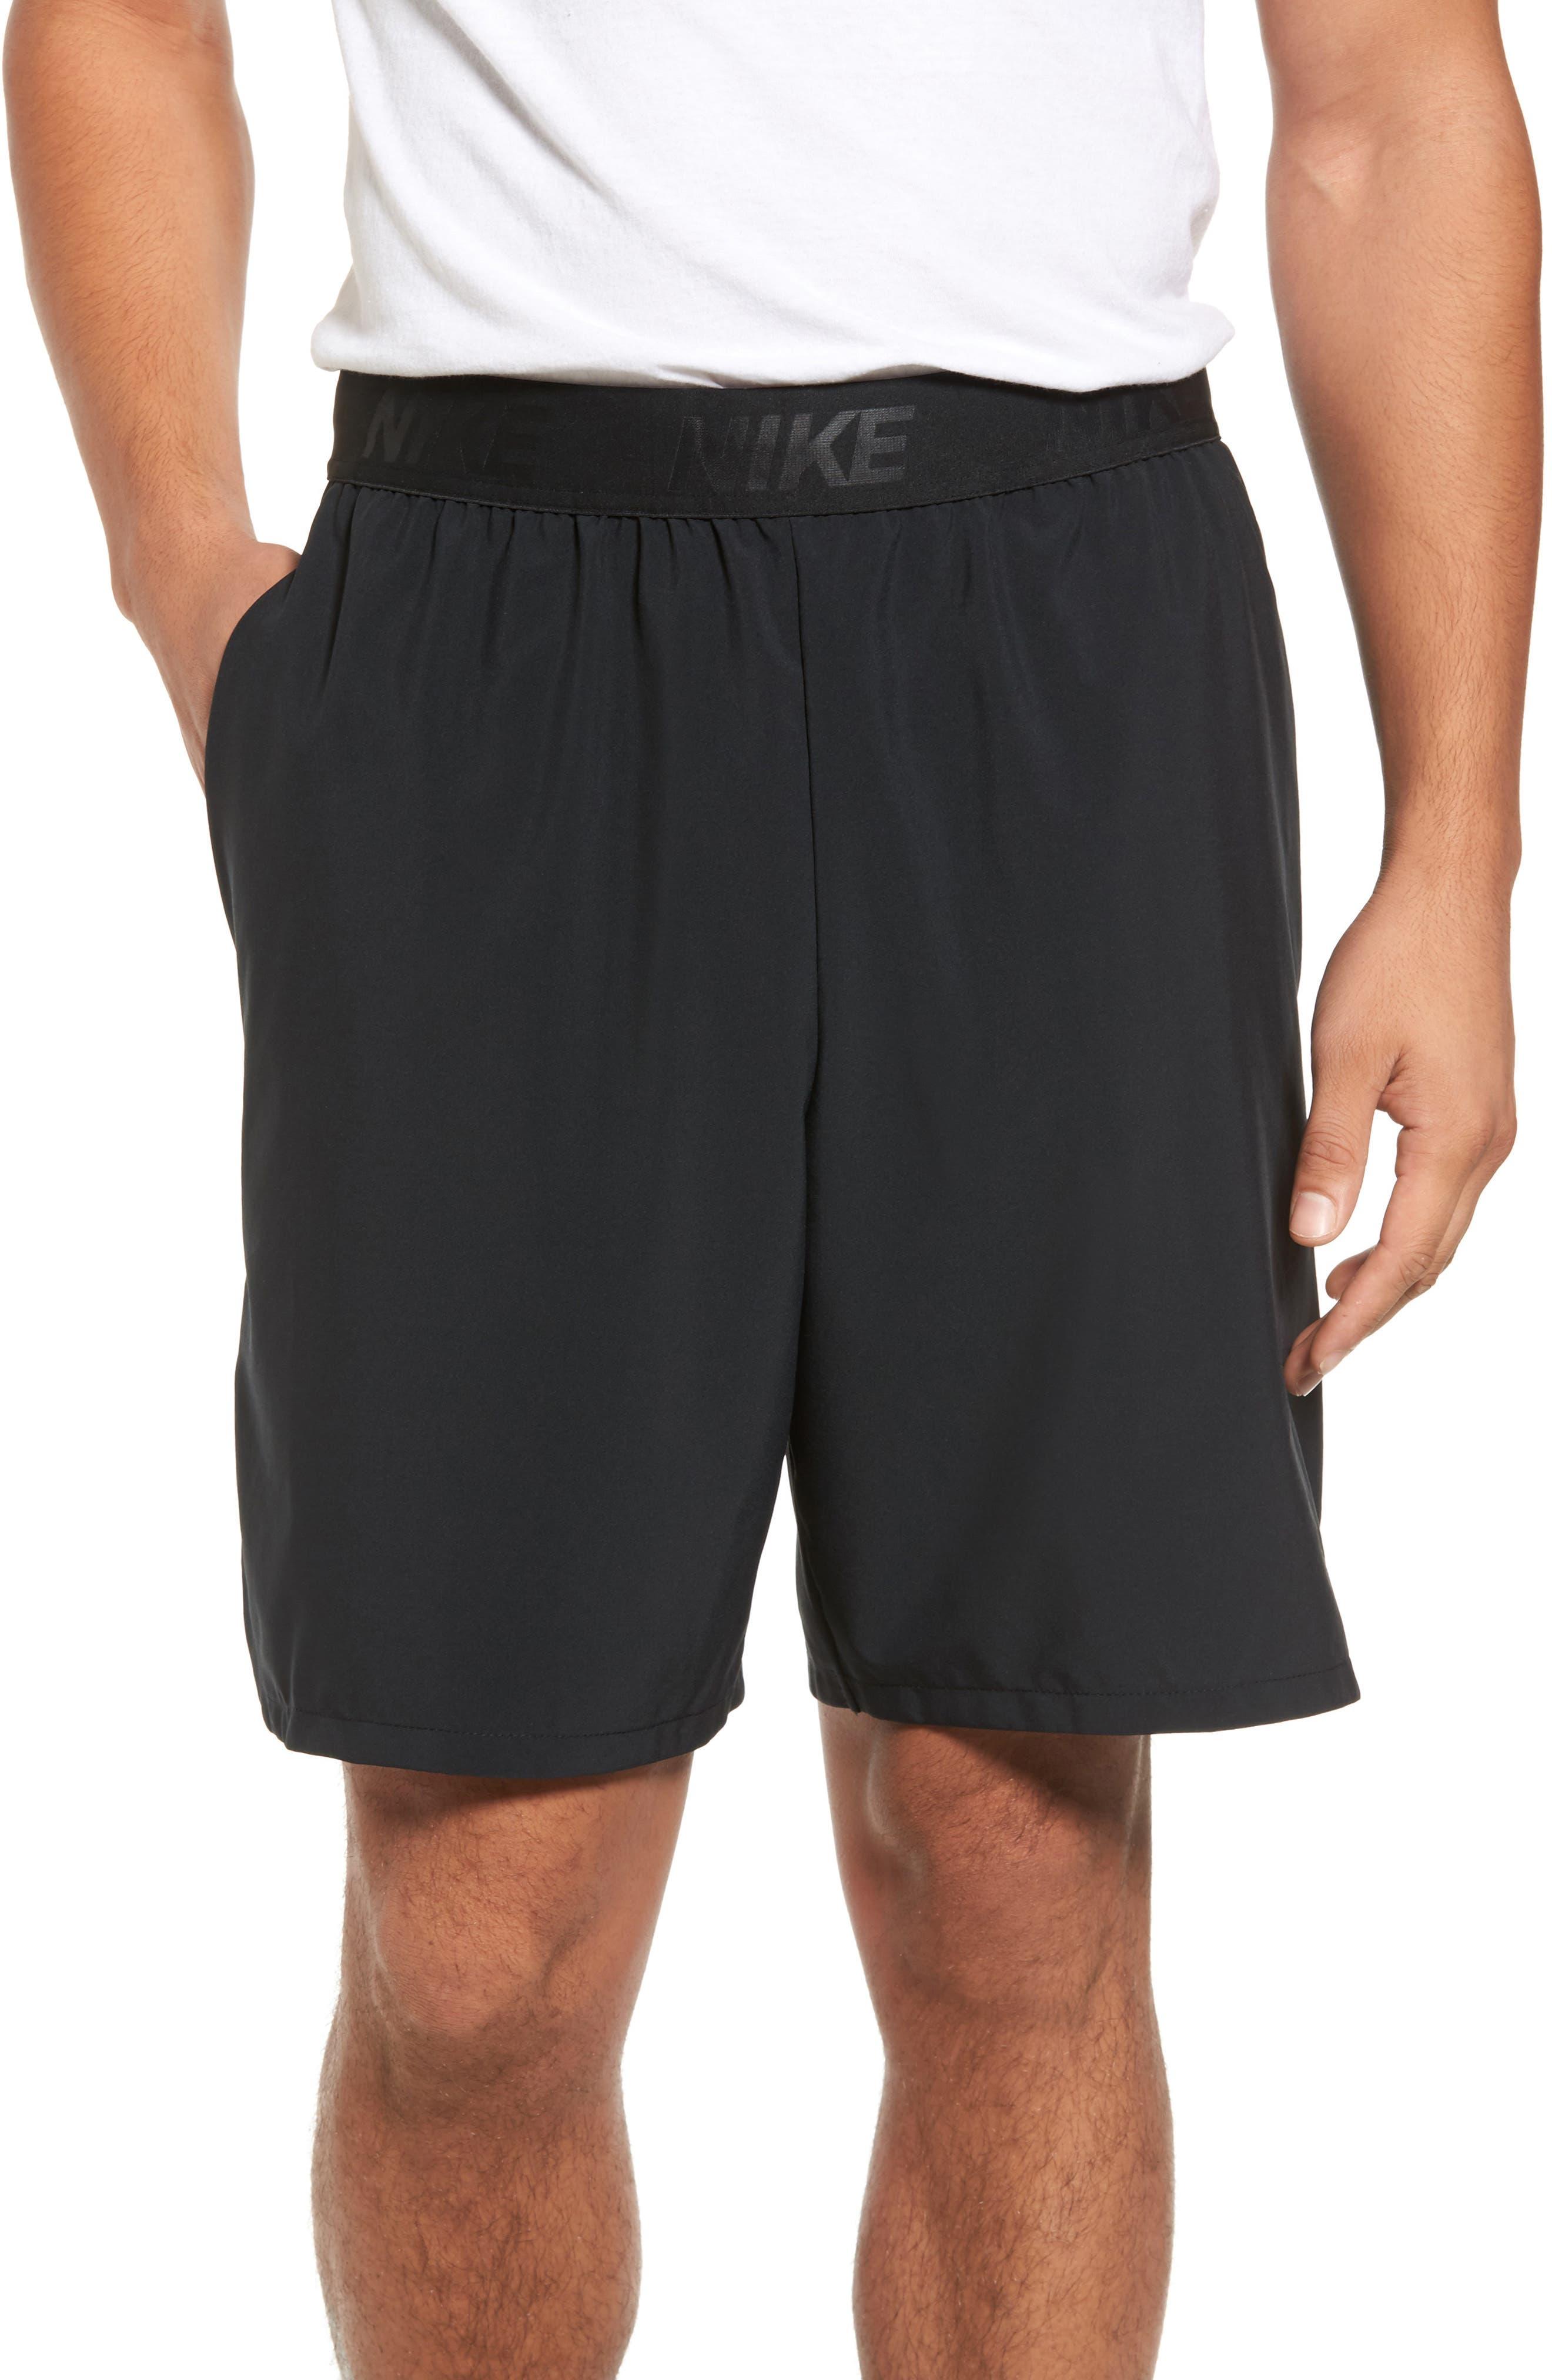 Nike Flex Vent Max Shorts Black